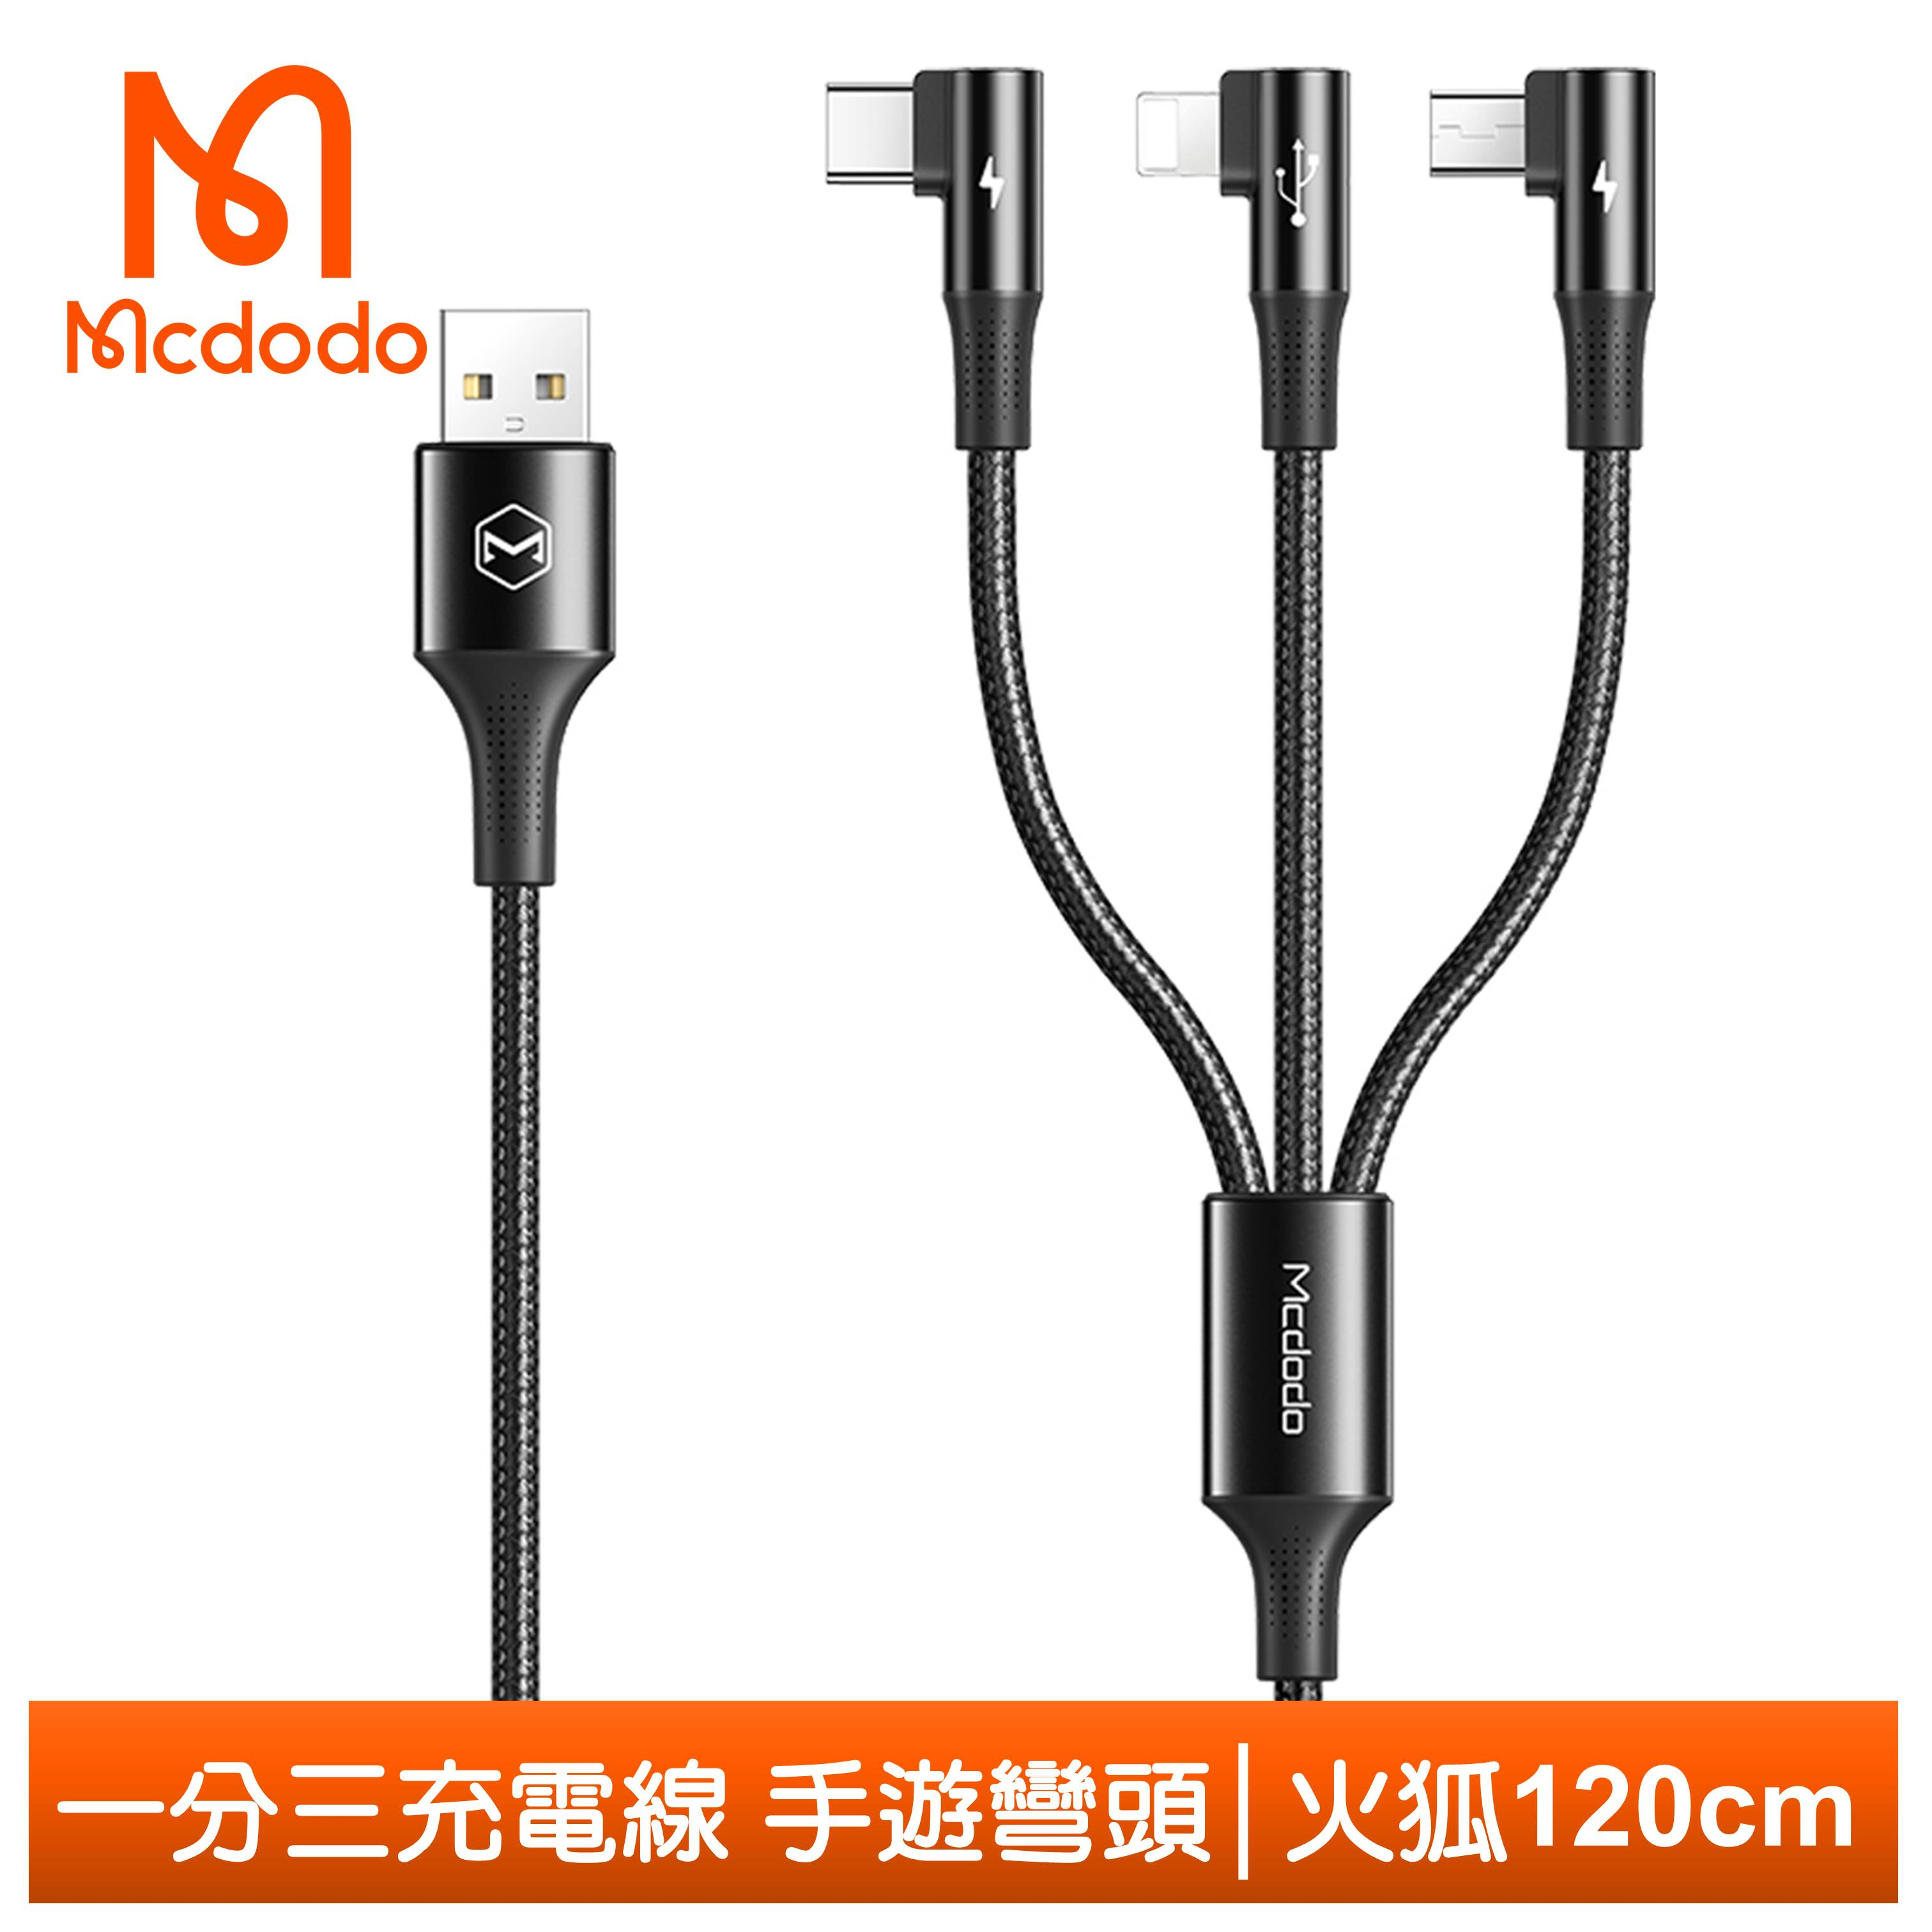 Mcdodo麥多多台灣官方 一分三 Lightning/TypeC/安卓MicroUSB/iPhone充電線傳輸線 手遊彎頭 火狐 1.2M 黑色